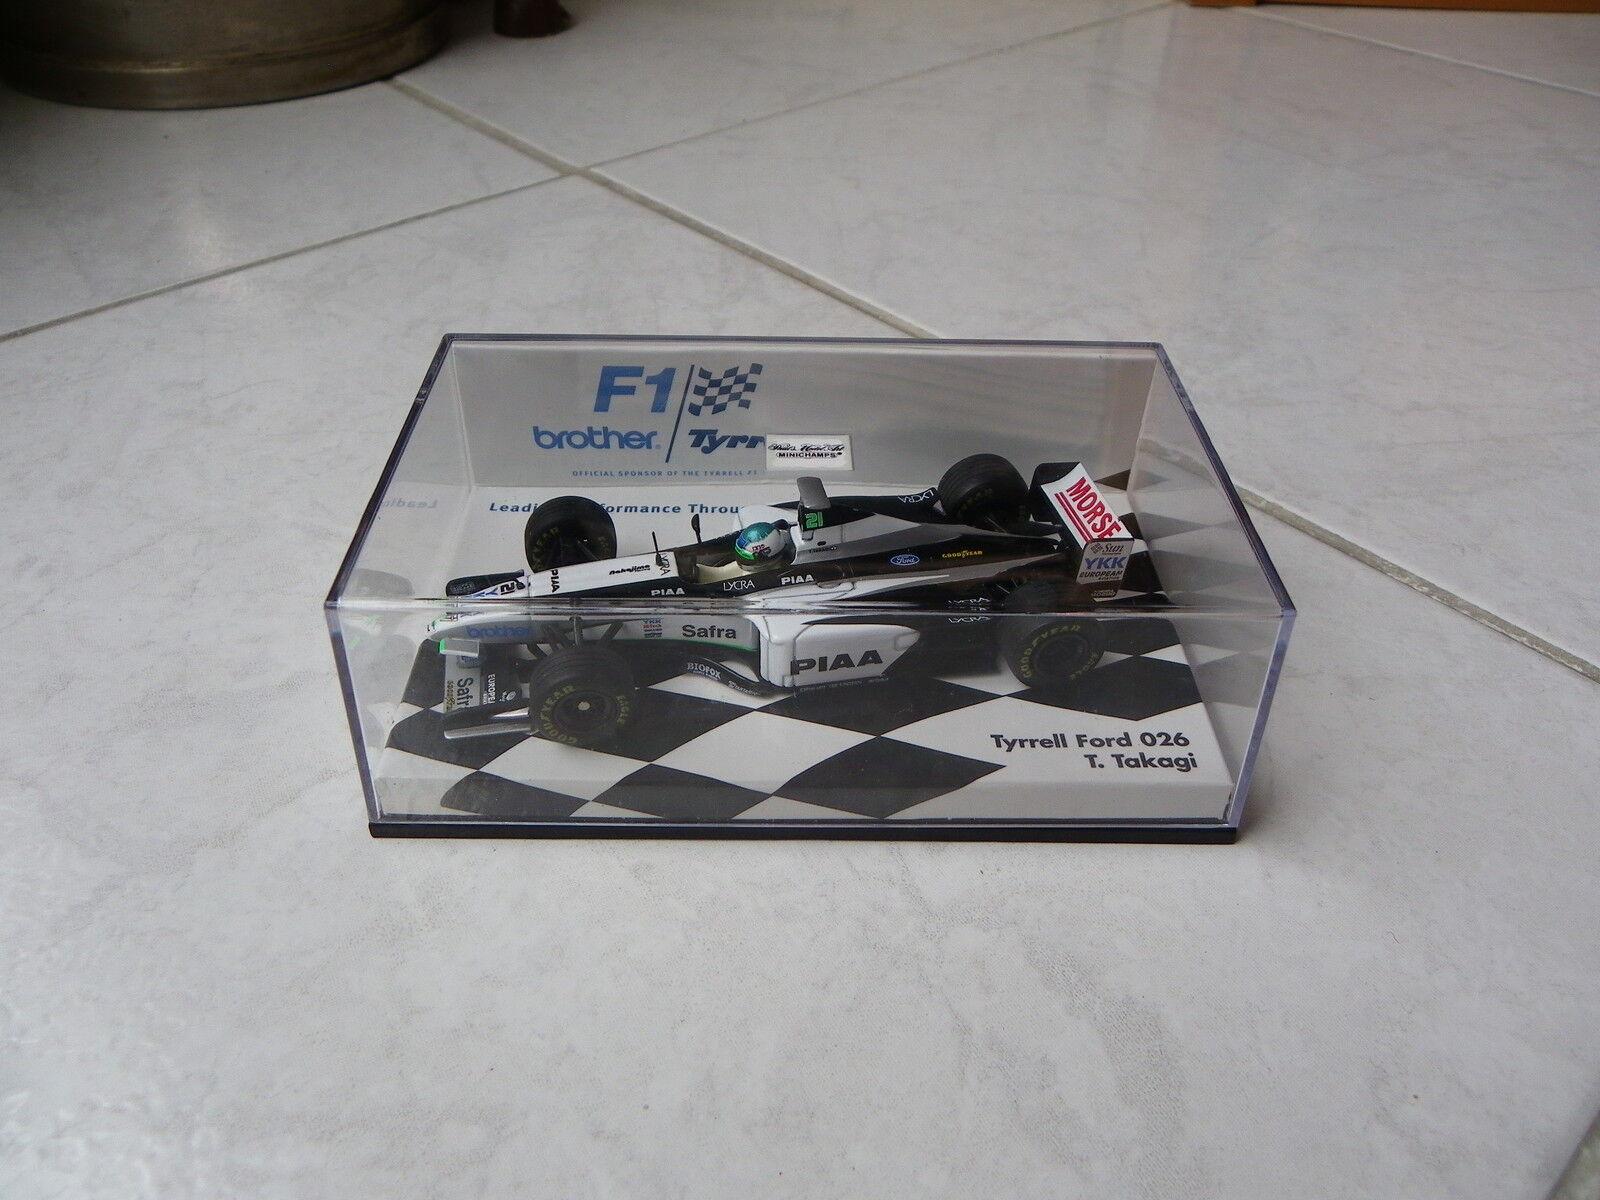 Tyrrell Ford 026 Tora Takagi n°21 Brougeher box Minichamps 1 43 1998 Formule 1 F1